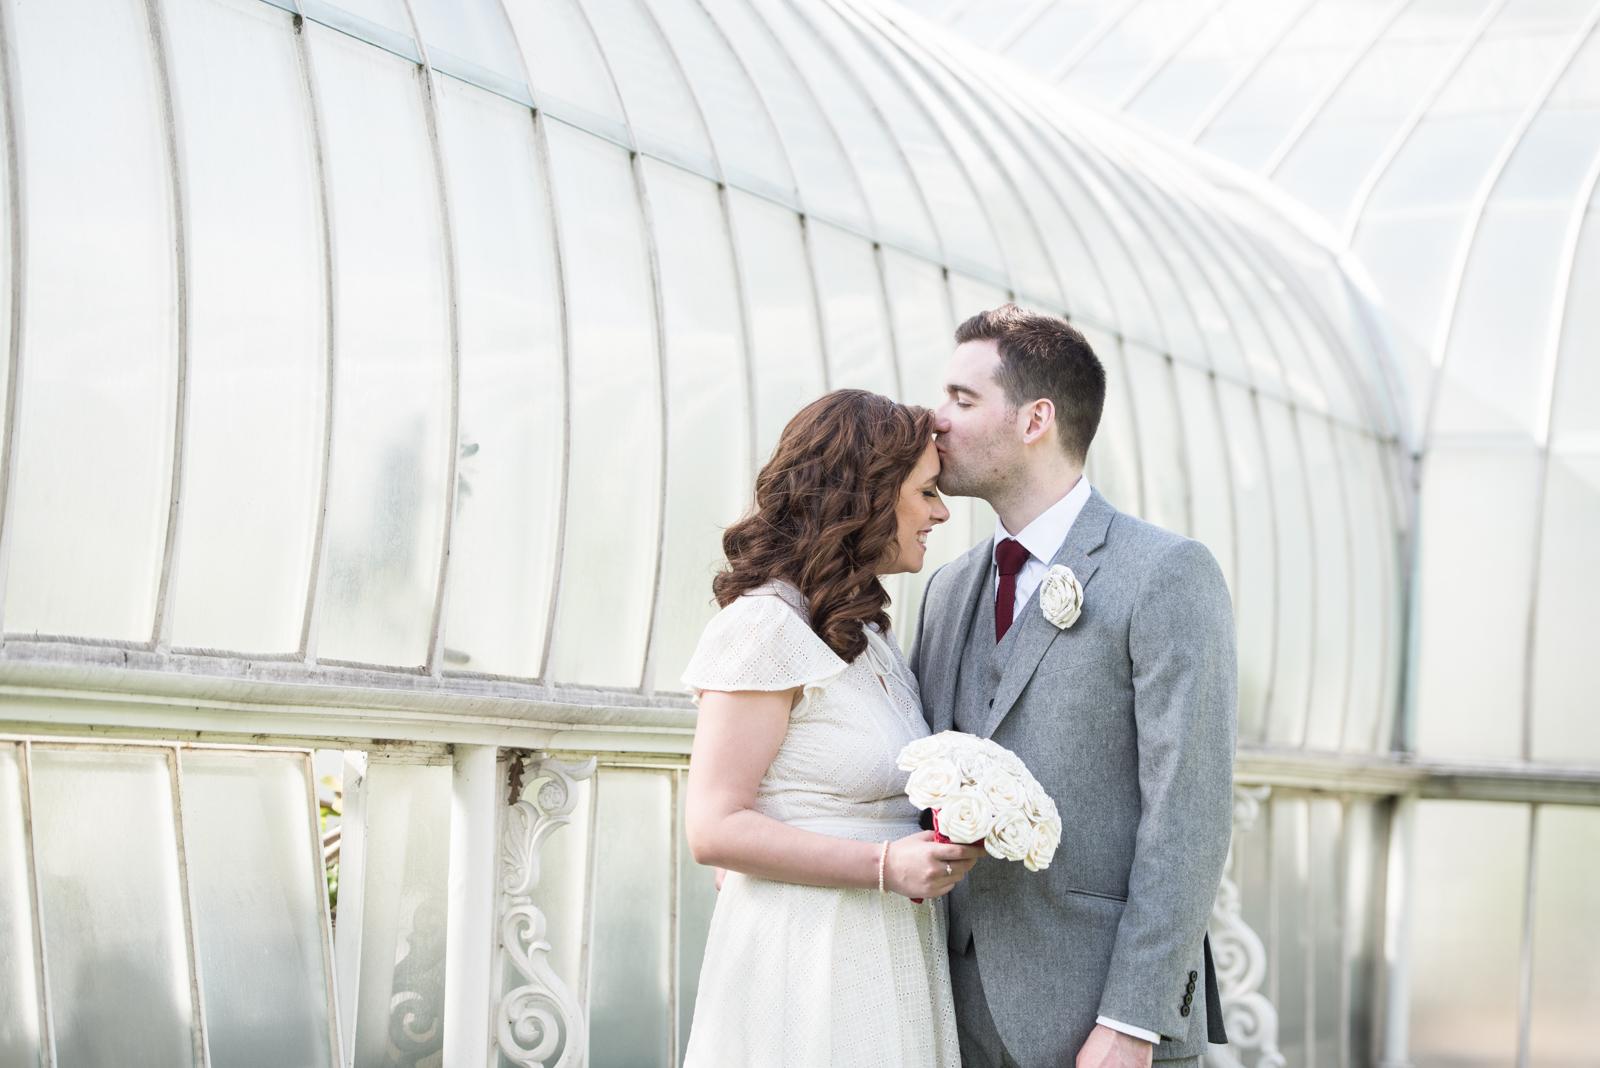 Victoria & Alan's wedding - 9 May 2015 - © Julie Broadfoot - www.juliebee.co.uk